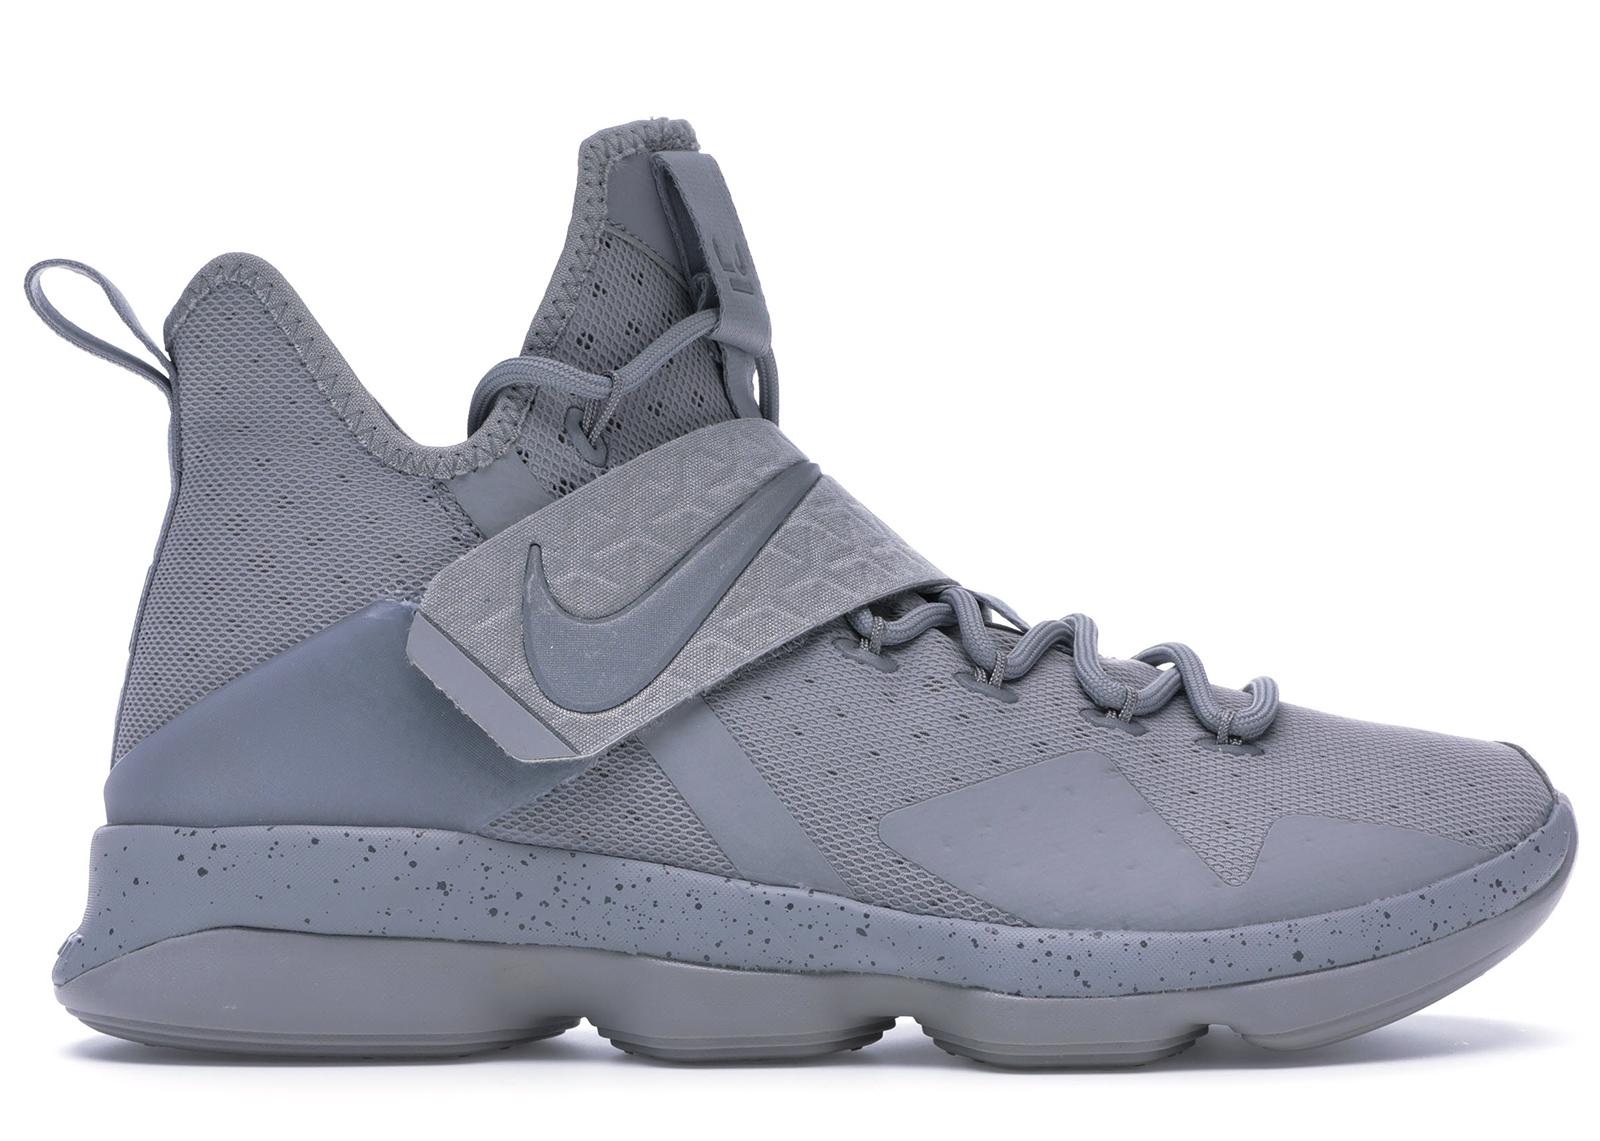 Nike LeBron 14 Silver - 852405-007